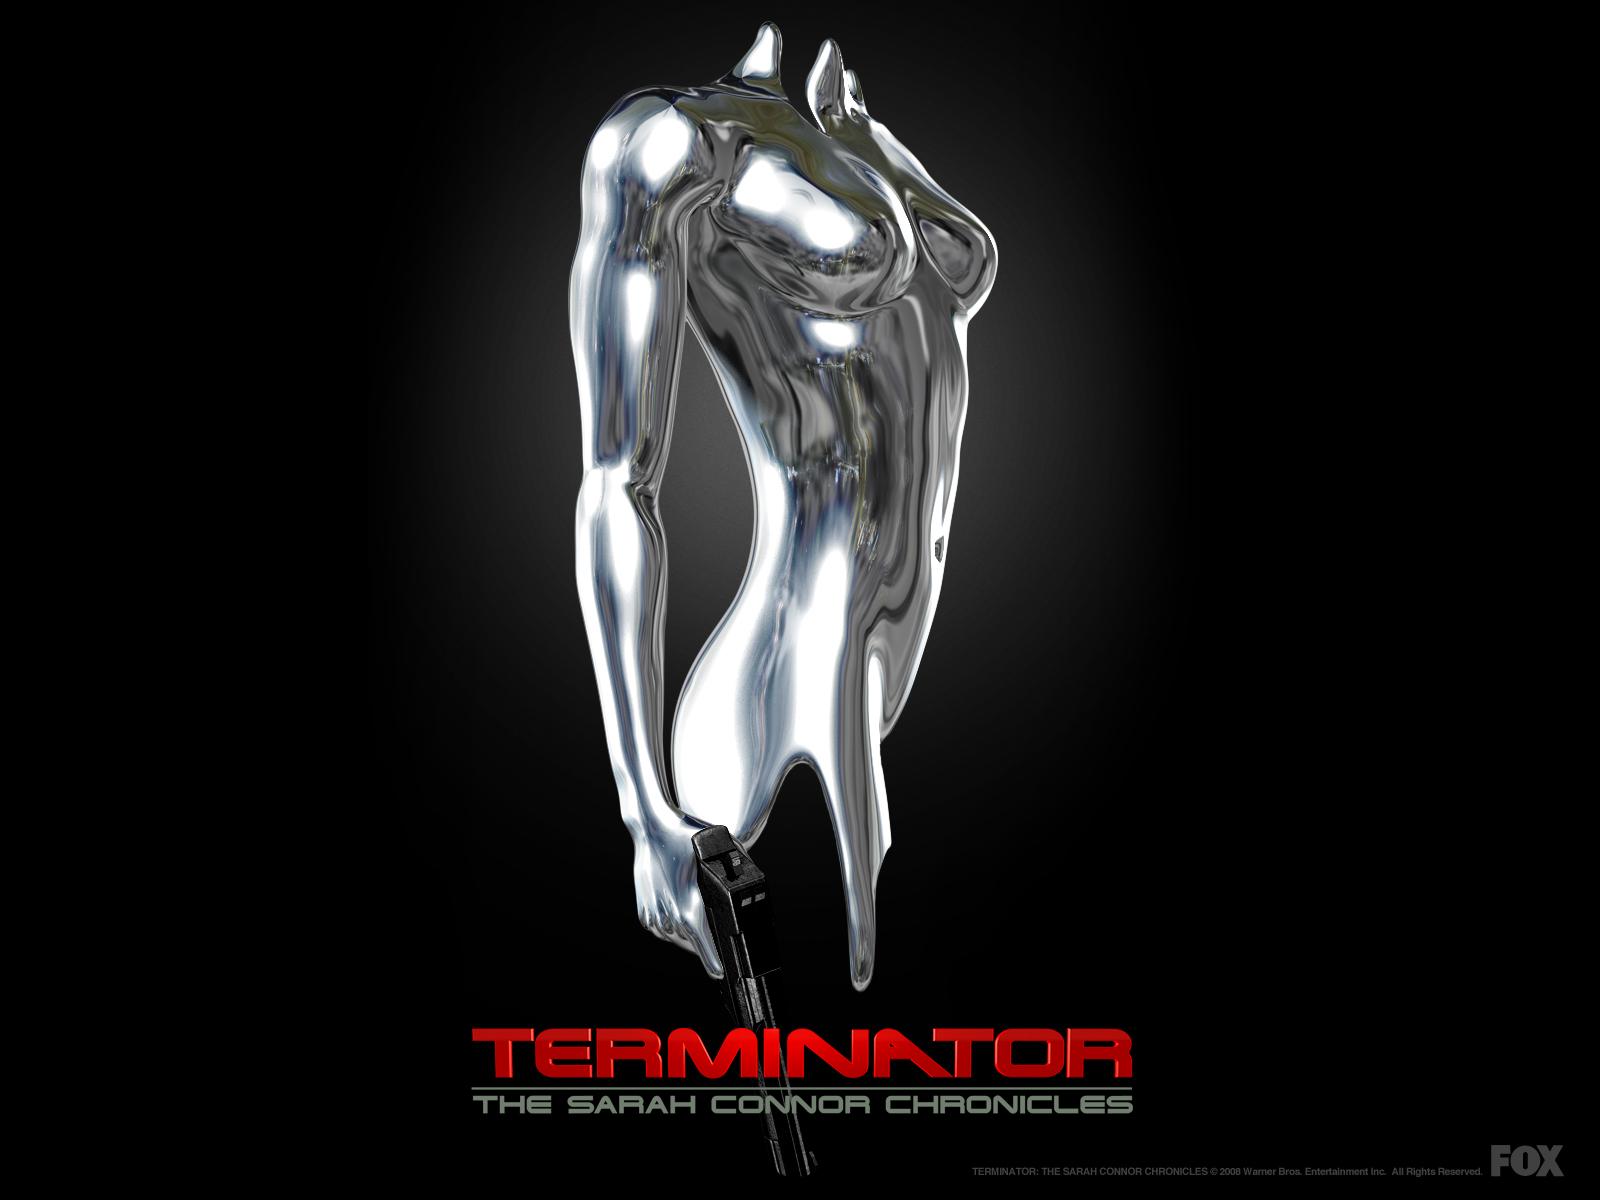 terminator-the-sarah-connor-chronicles-43-terminator-sarah-connor